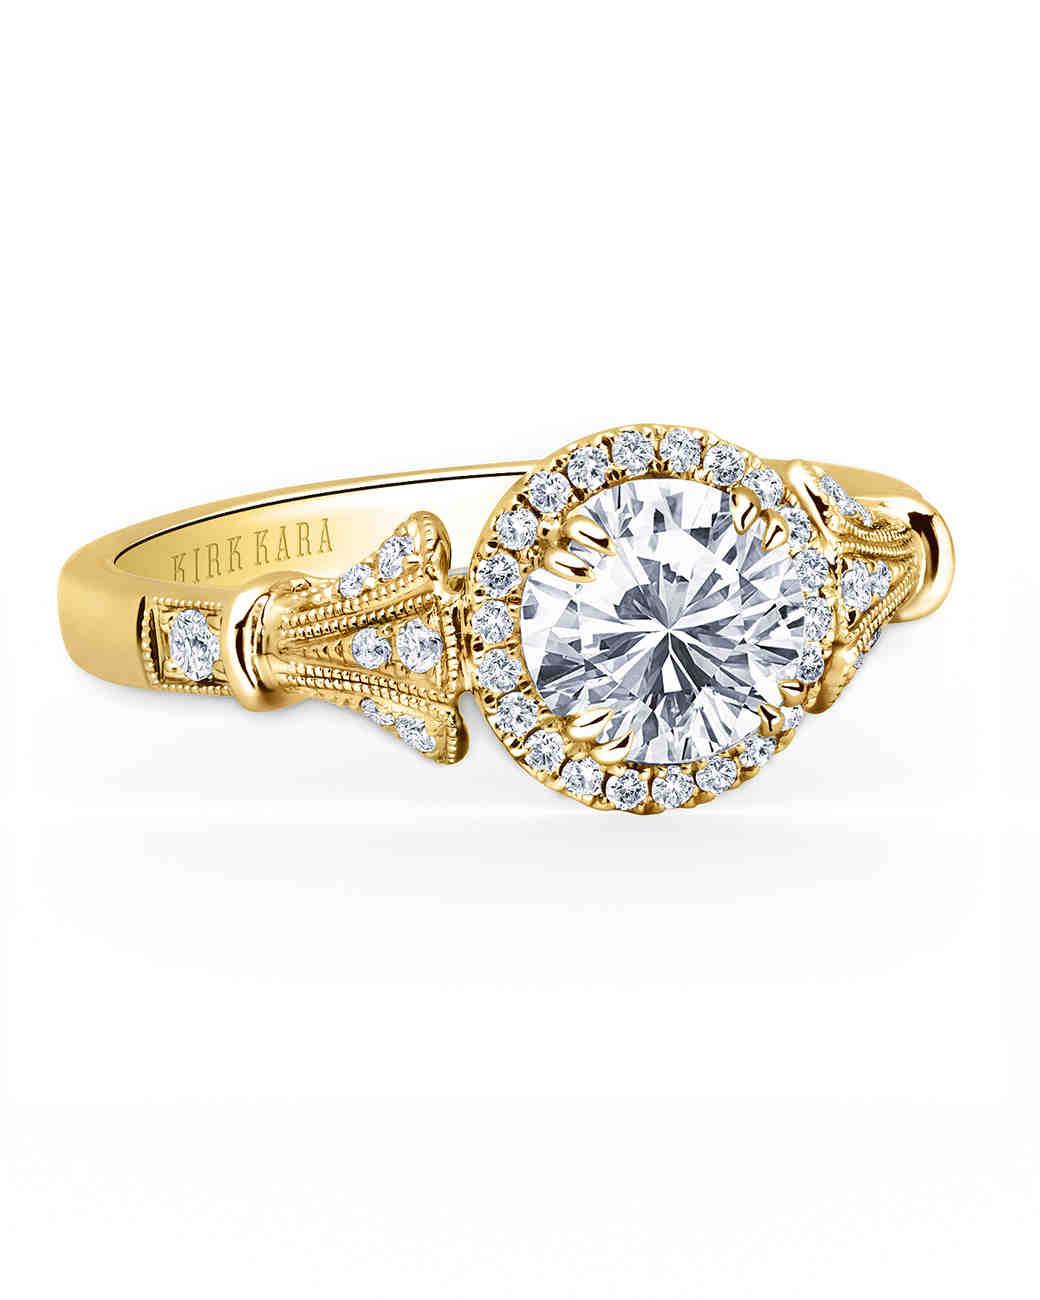 Kirk Kara Yellow Gold Engagement Ring with Detailed Shank